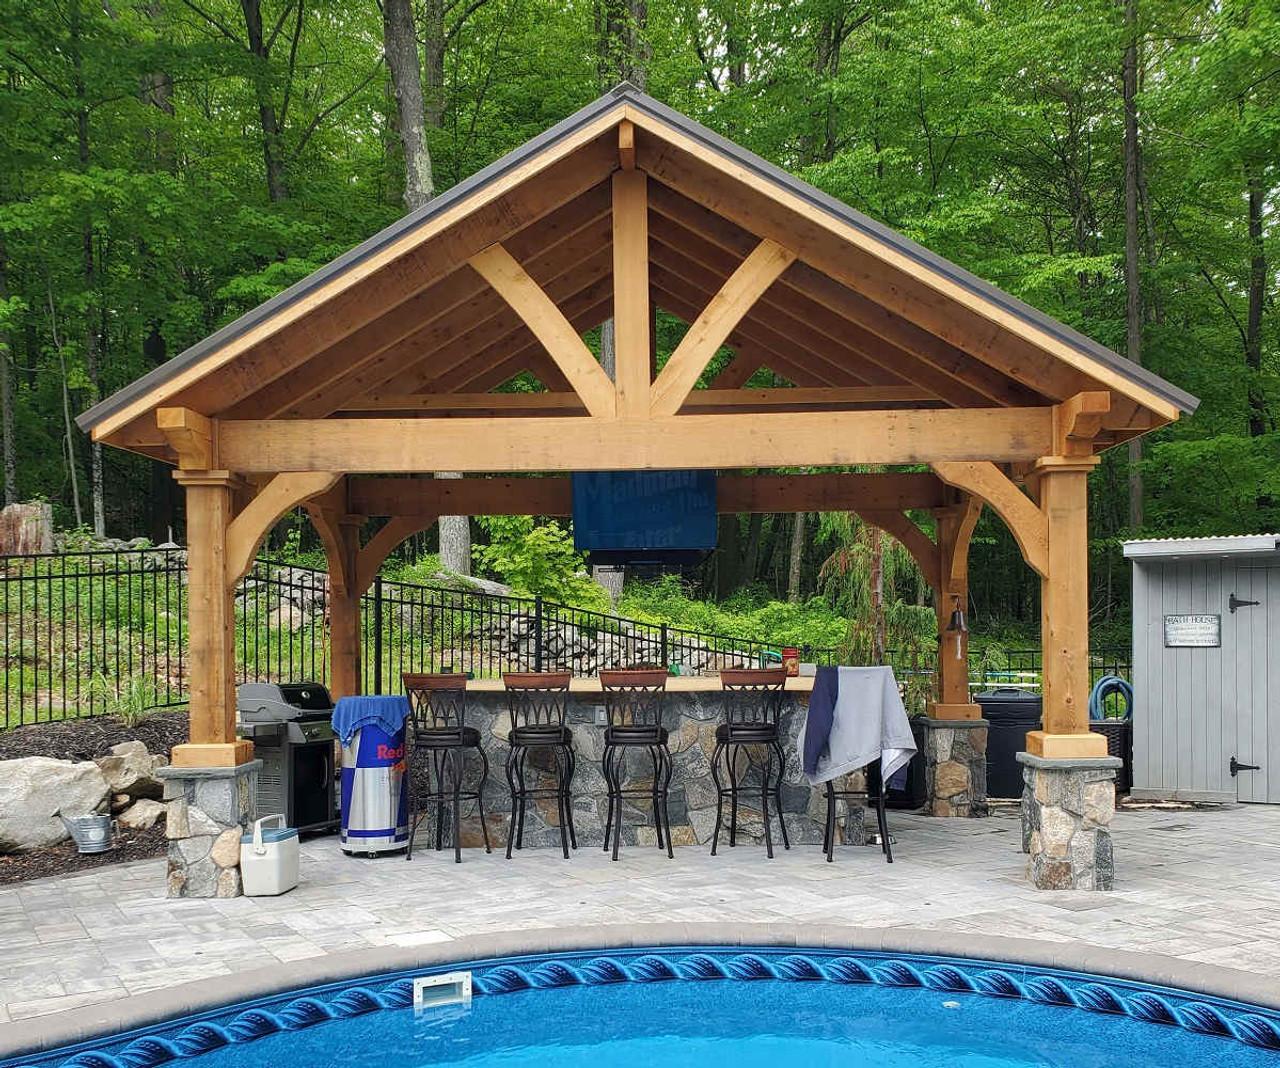 17x11 Grand Cedar Pavilion Kit, New Milford, Connecticut